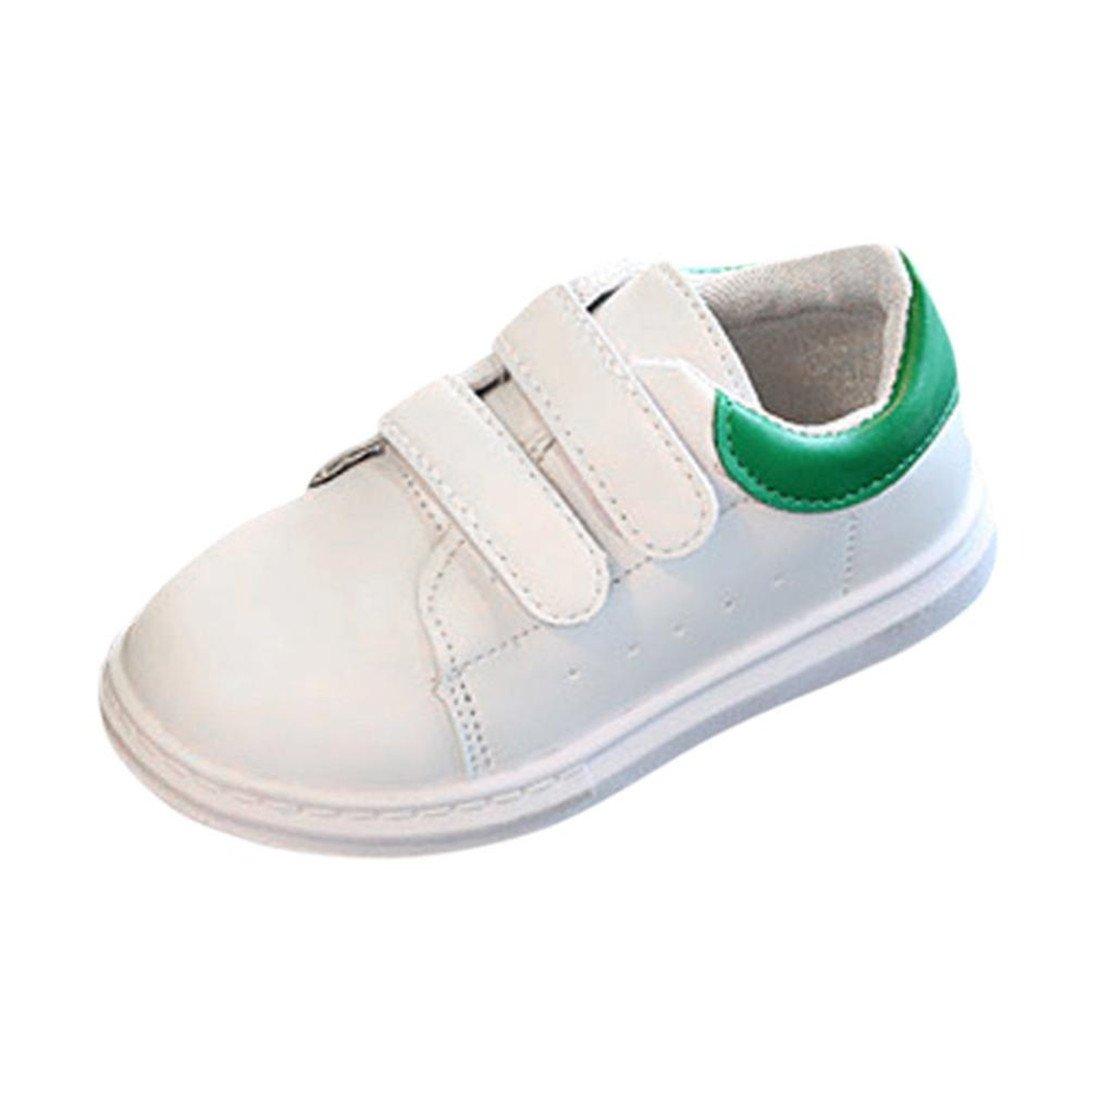 Btruely Sneaker Schuhe Baby Mode M/ädchen Jungen Kleinkind Beil/äufig Schuhe Sportschuhe